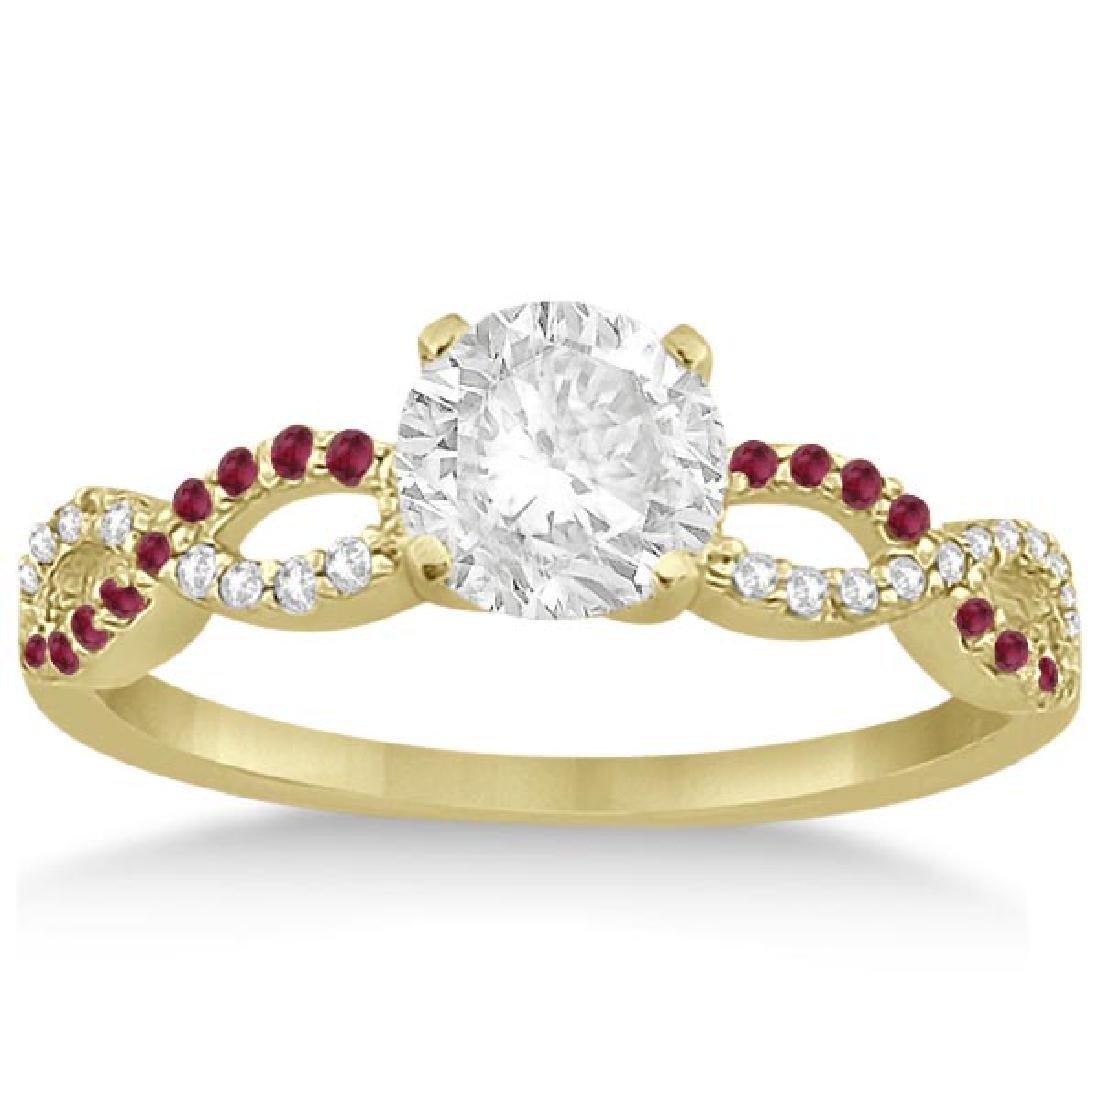 Infinity Diamond and Ruby Gemstone Engagement Ring 14K